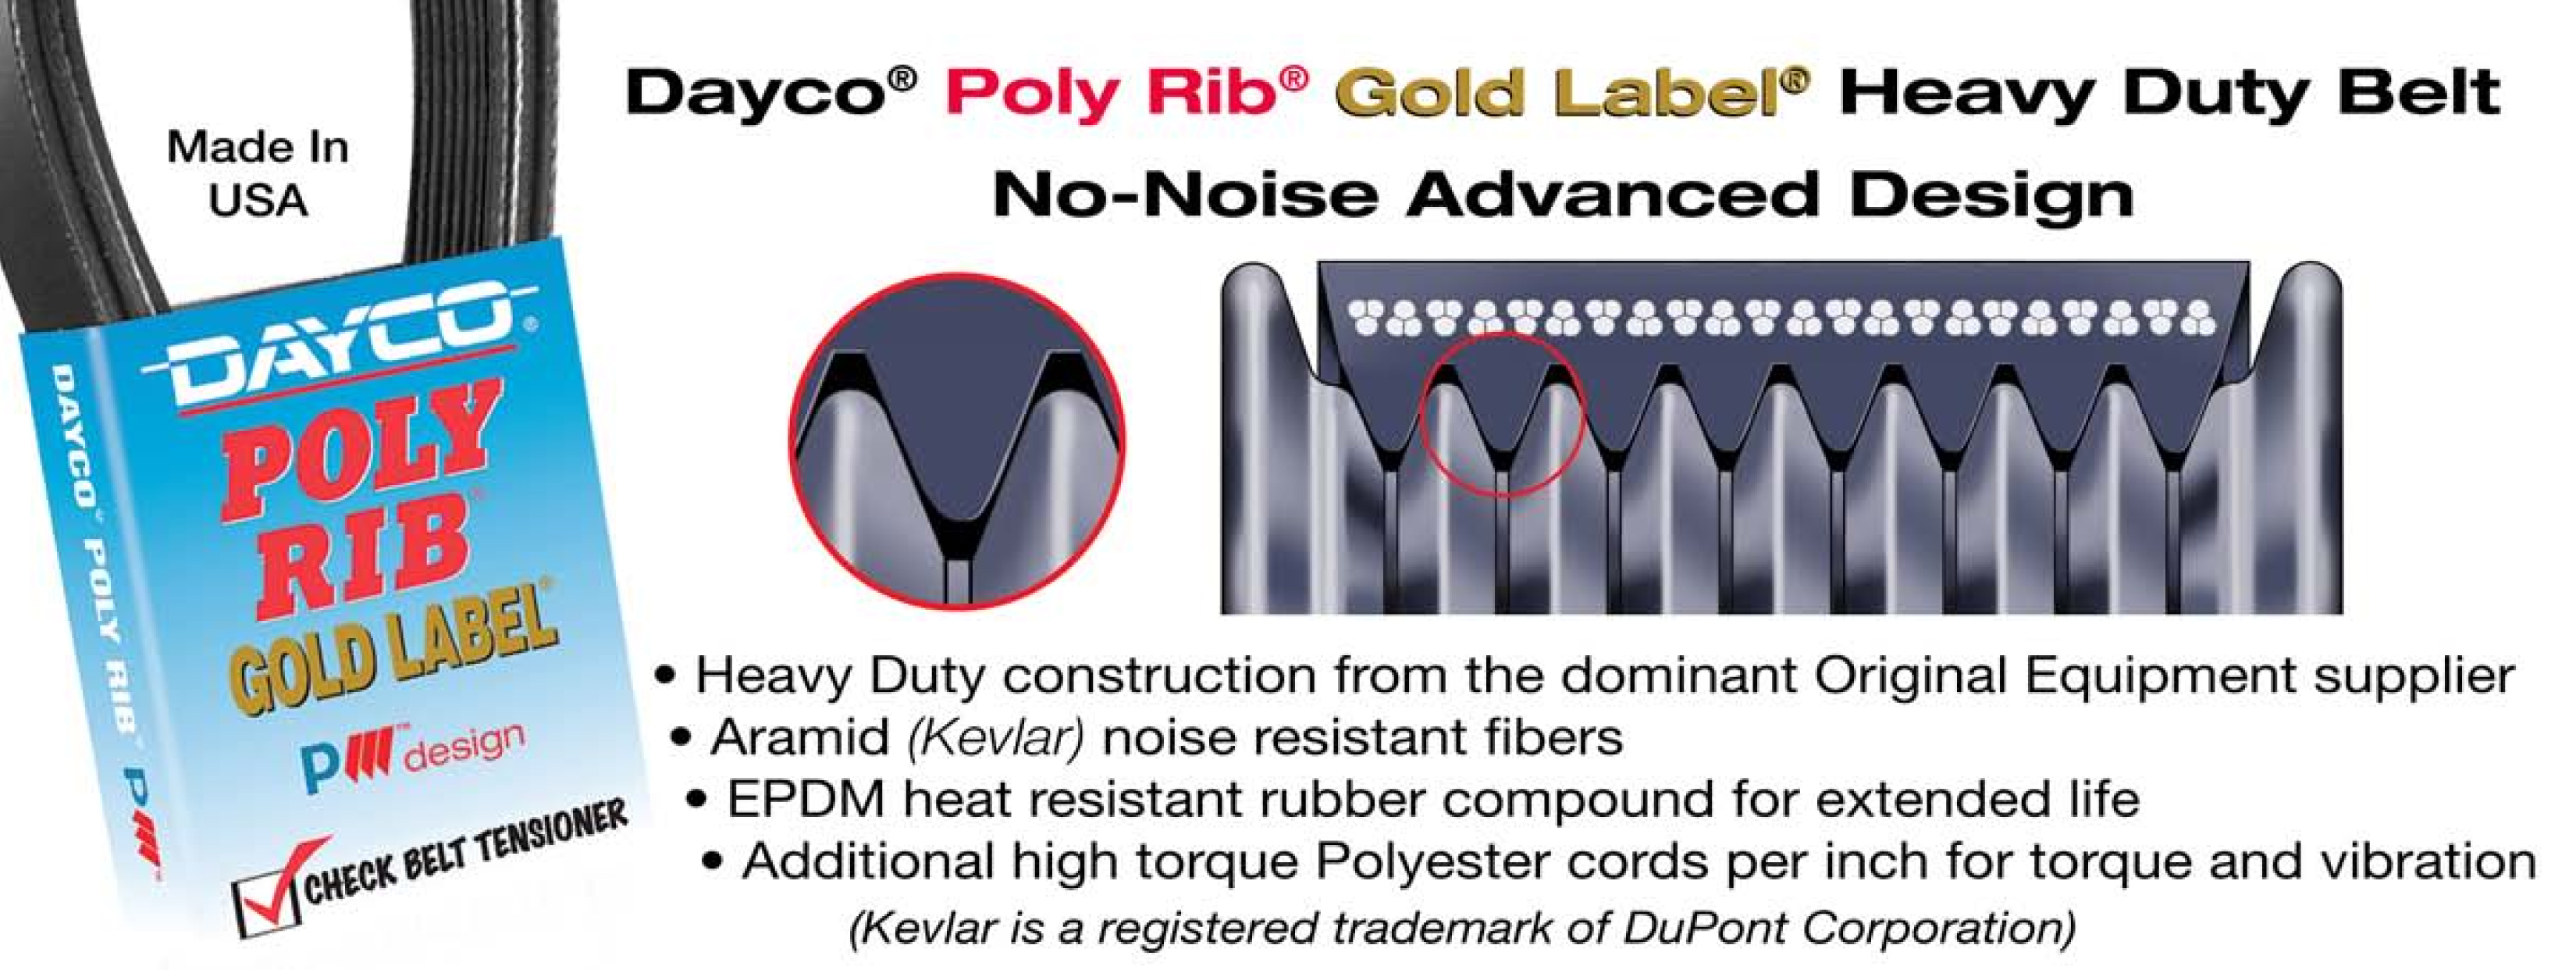 DAYCO 5080415 Poly Rib GOLD LABEL Belt